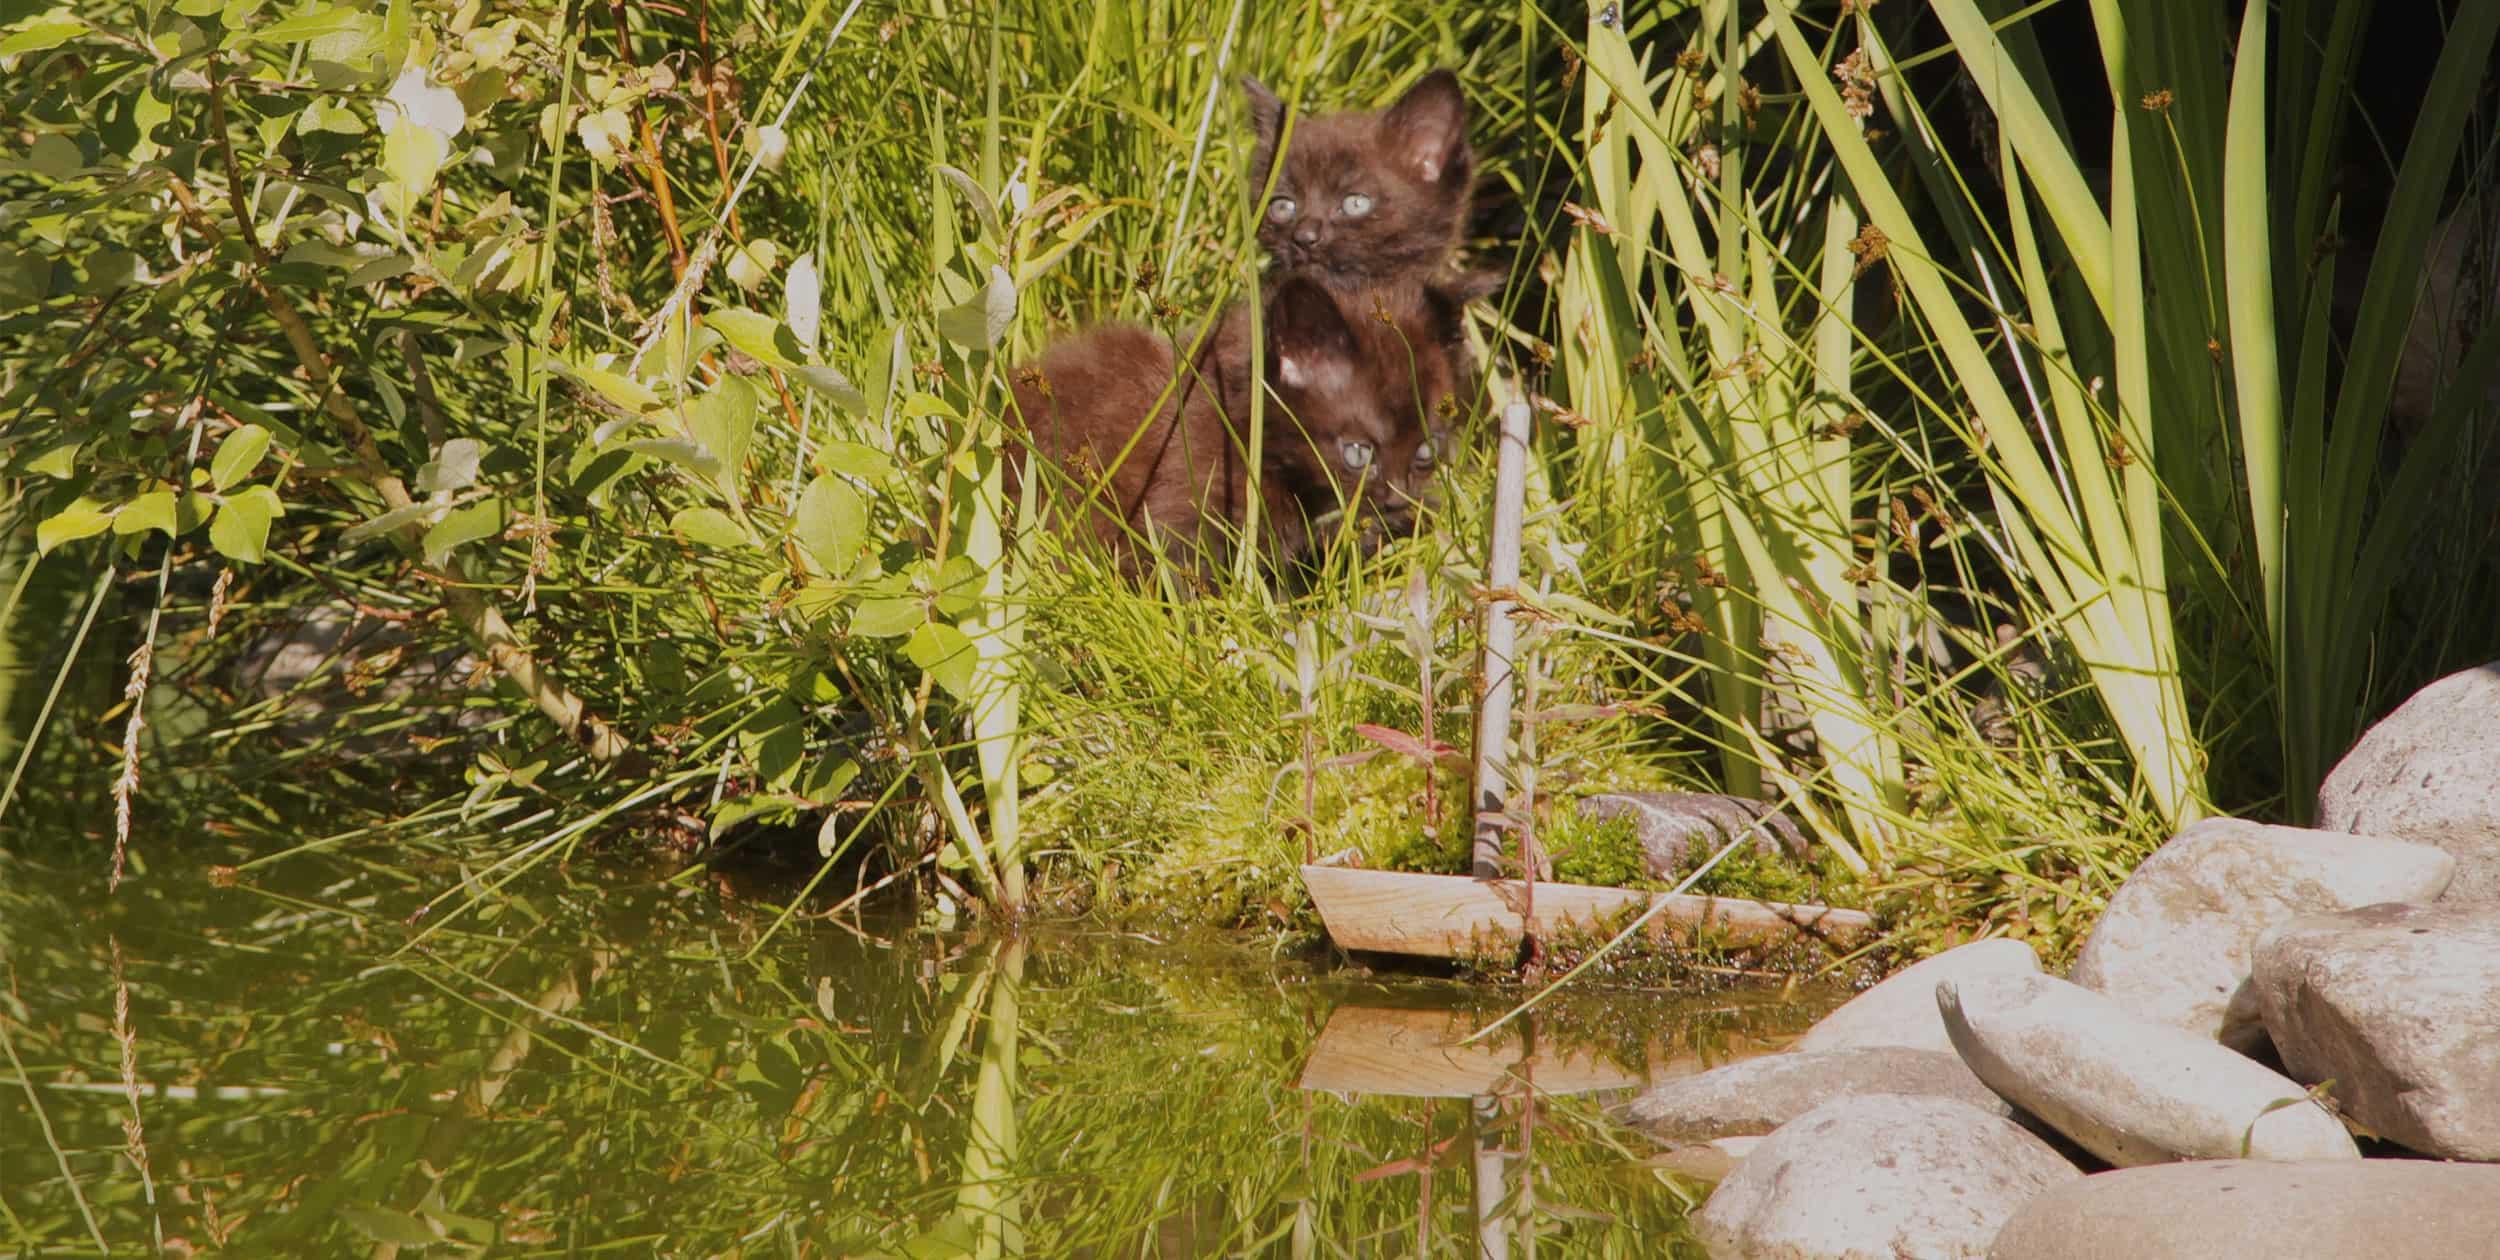 Katzenbabys am Teich